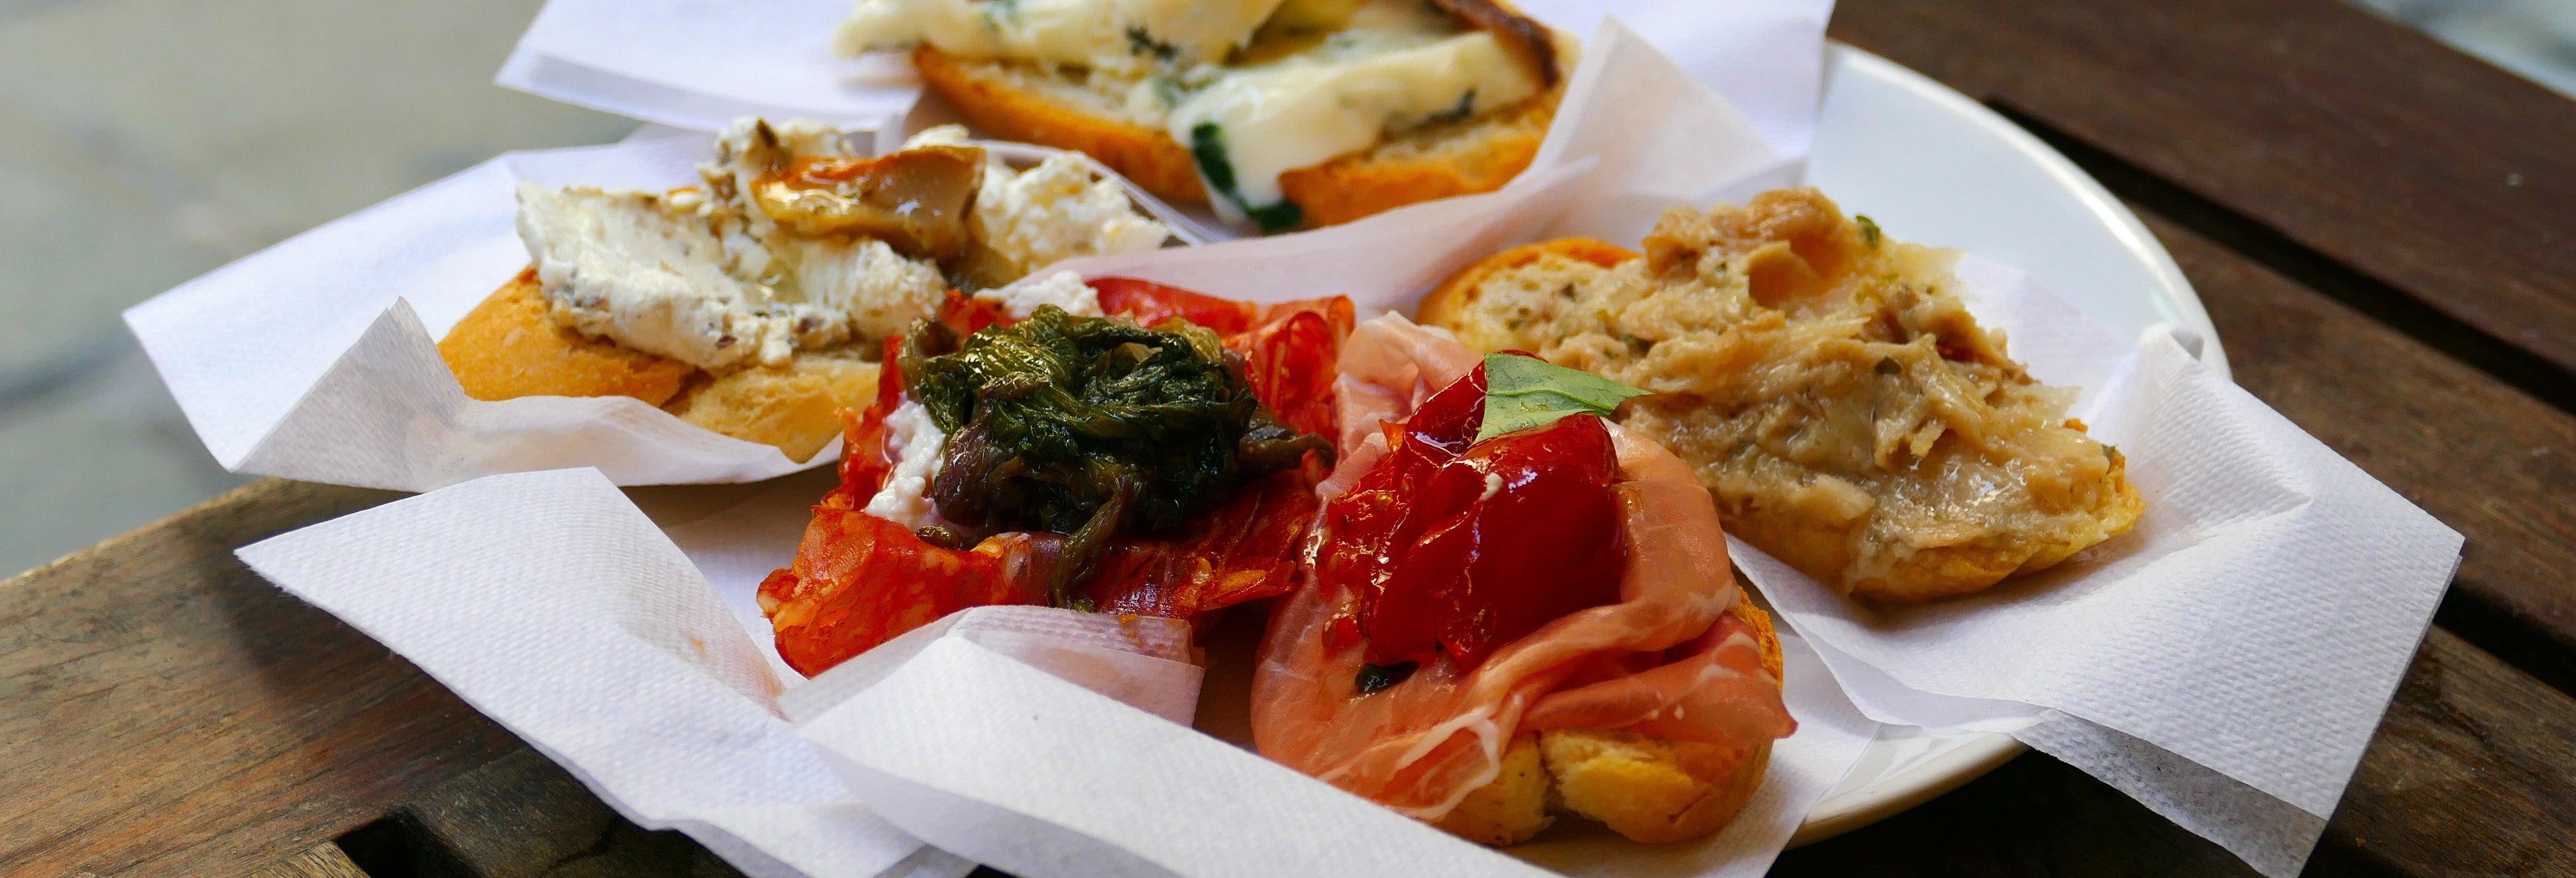 Tour gastronômico por Veneza